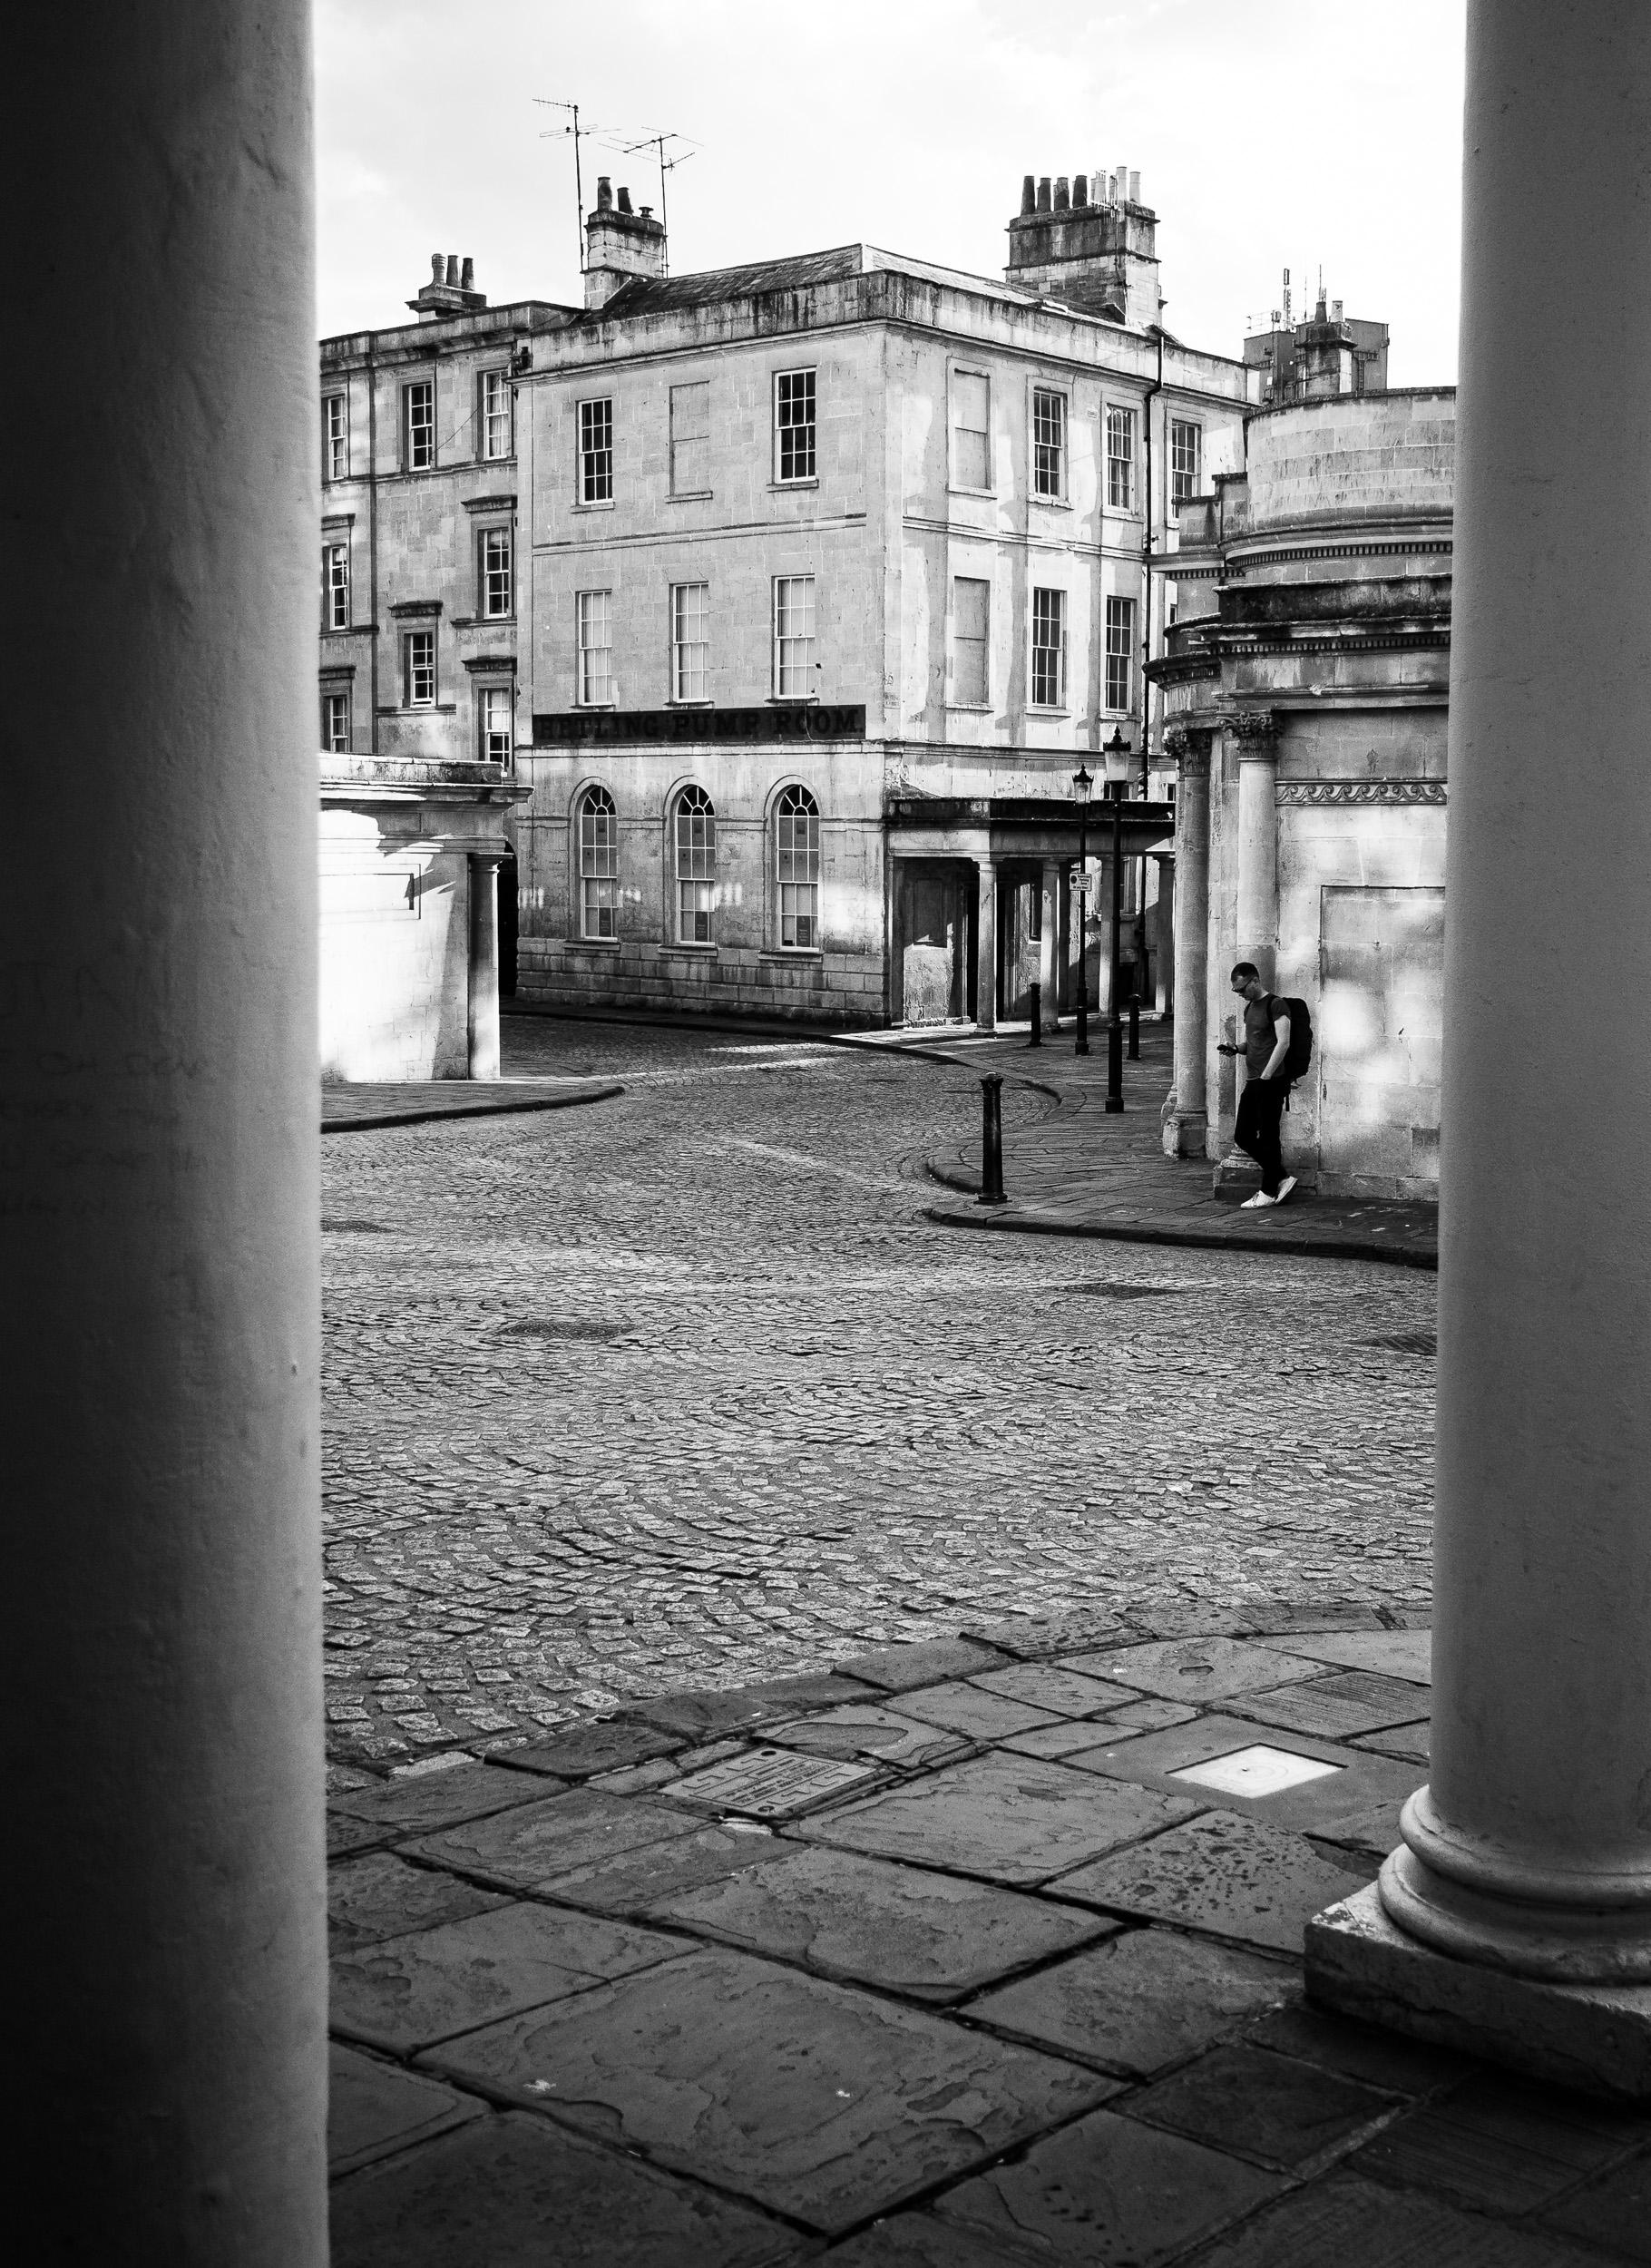 20190908-Streets of Bath #1.jpg